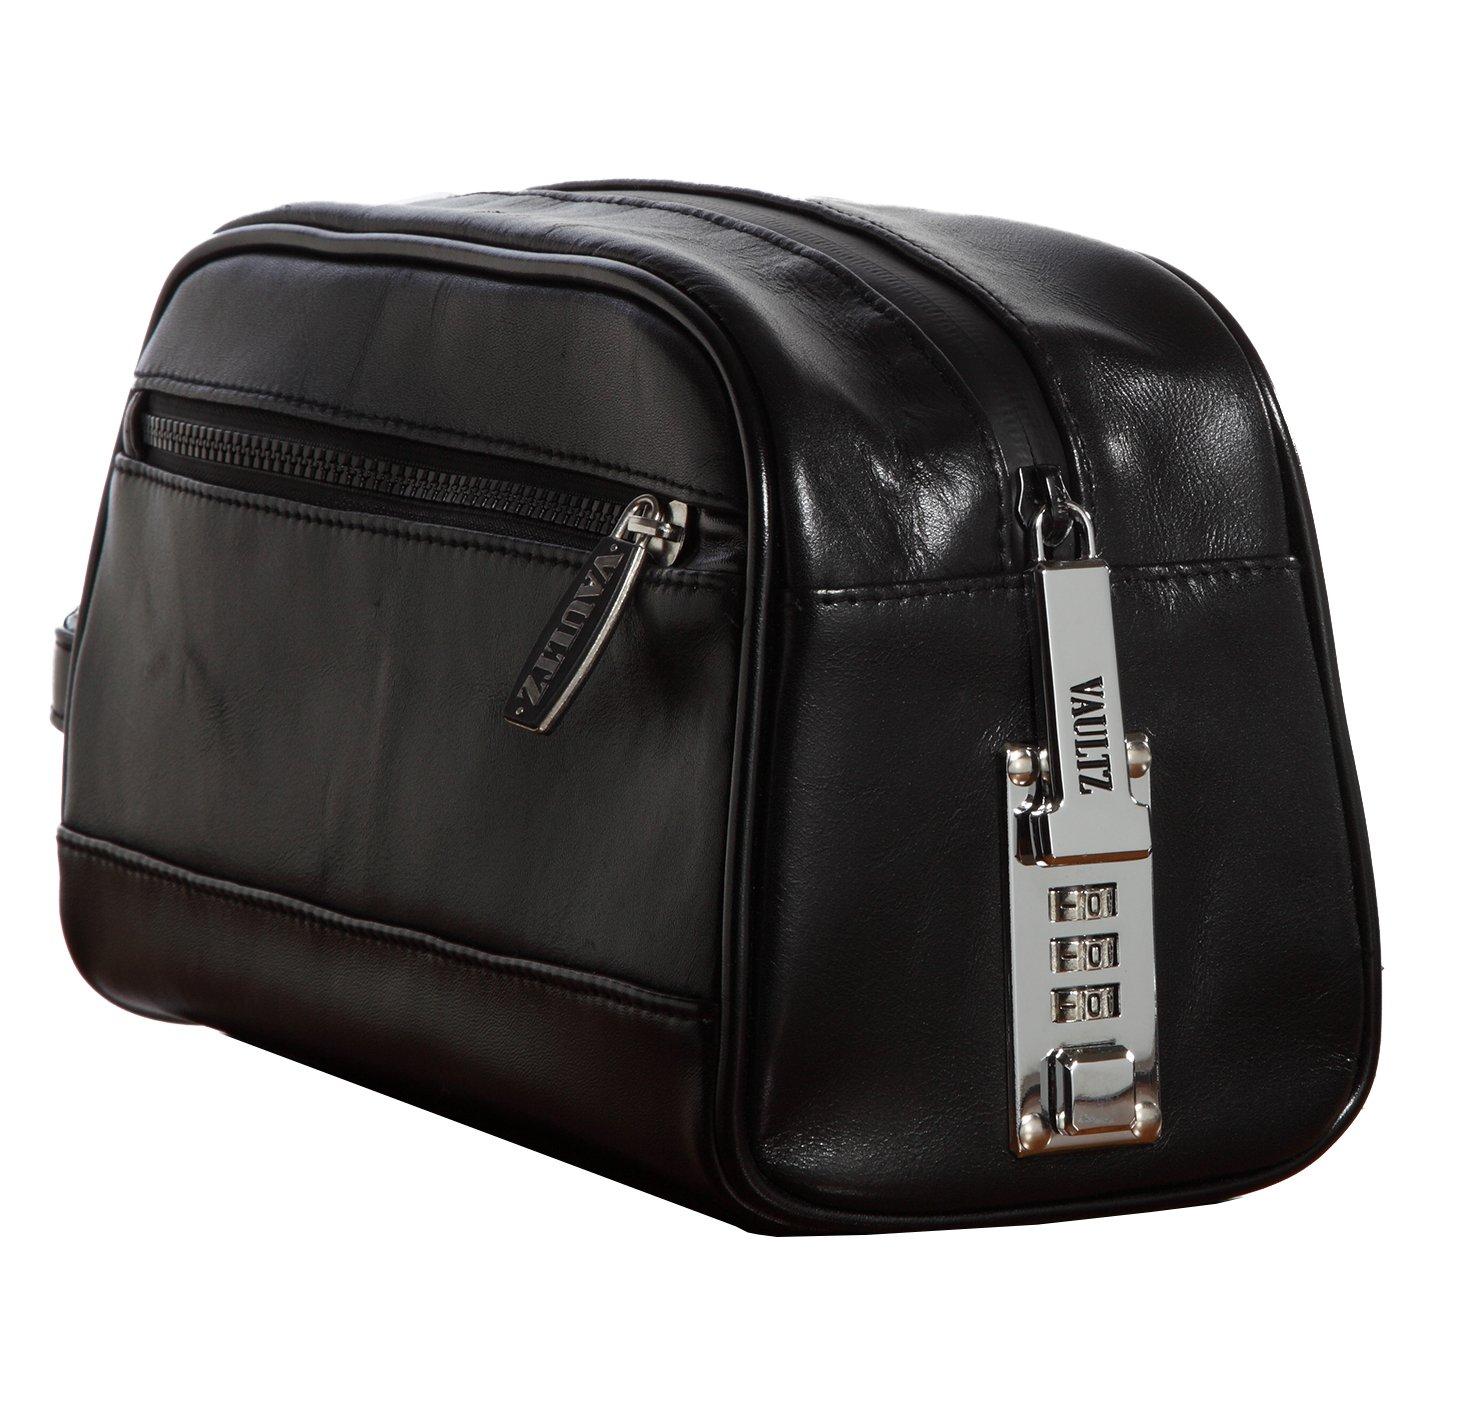 Vaultz Locking Leather Travel Kit, 5.75 x 5 x 10 Inches, Black (VZ03510)